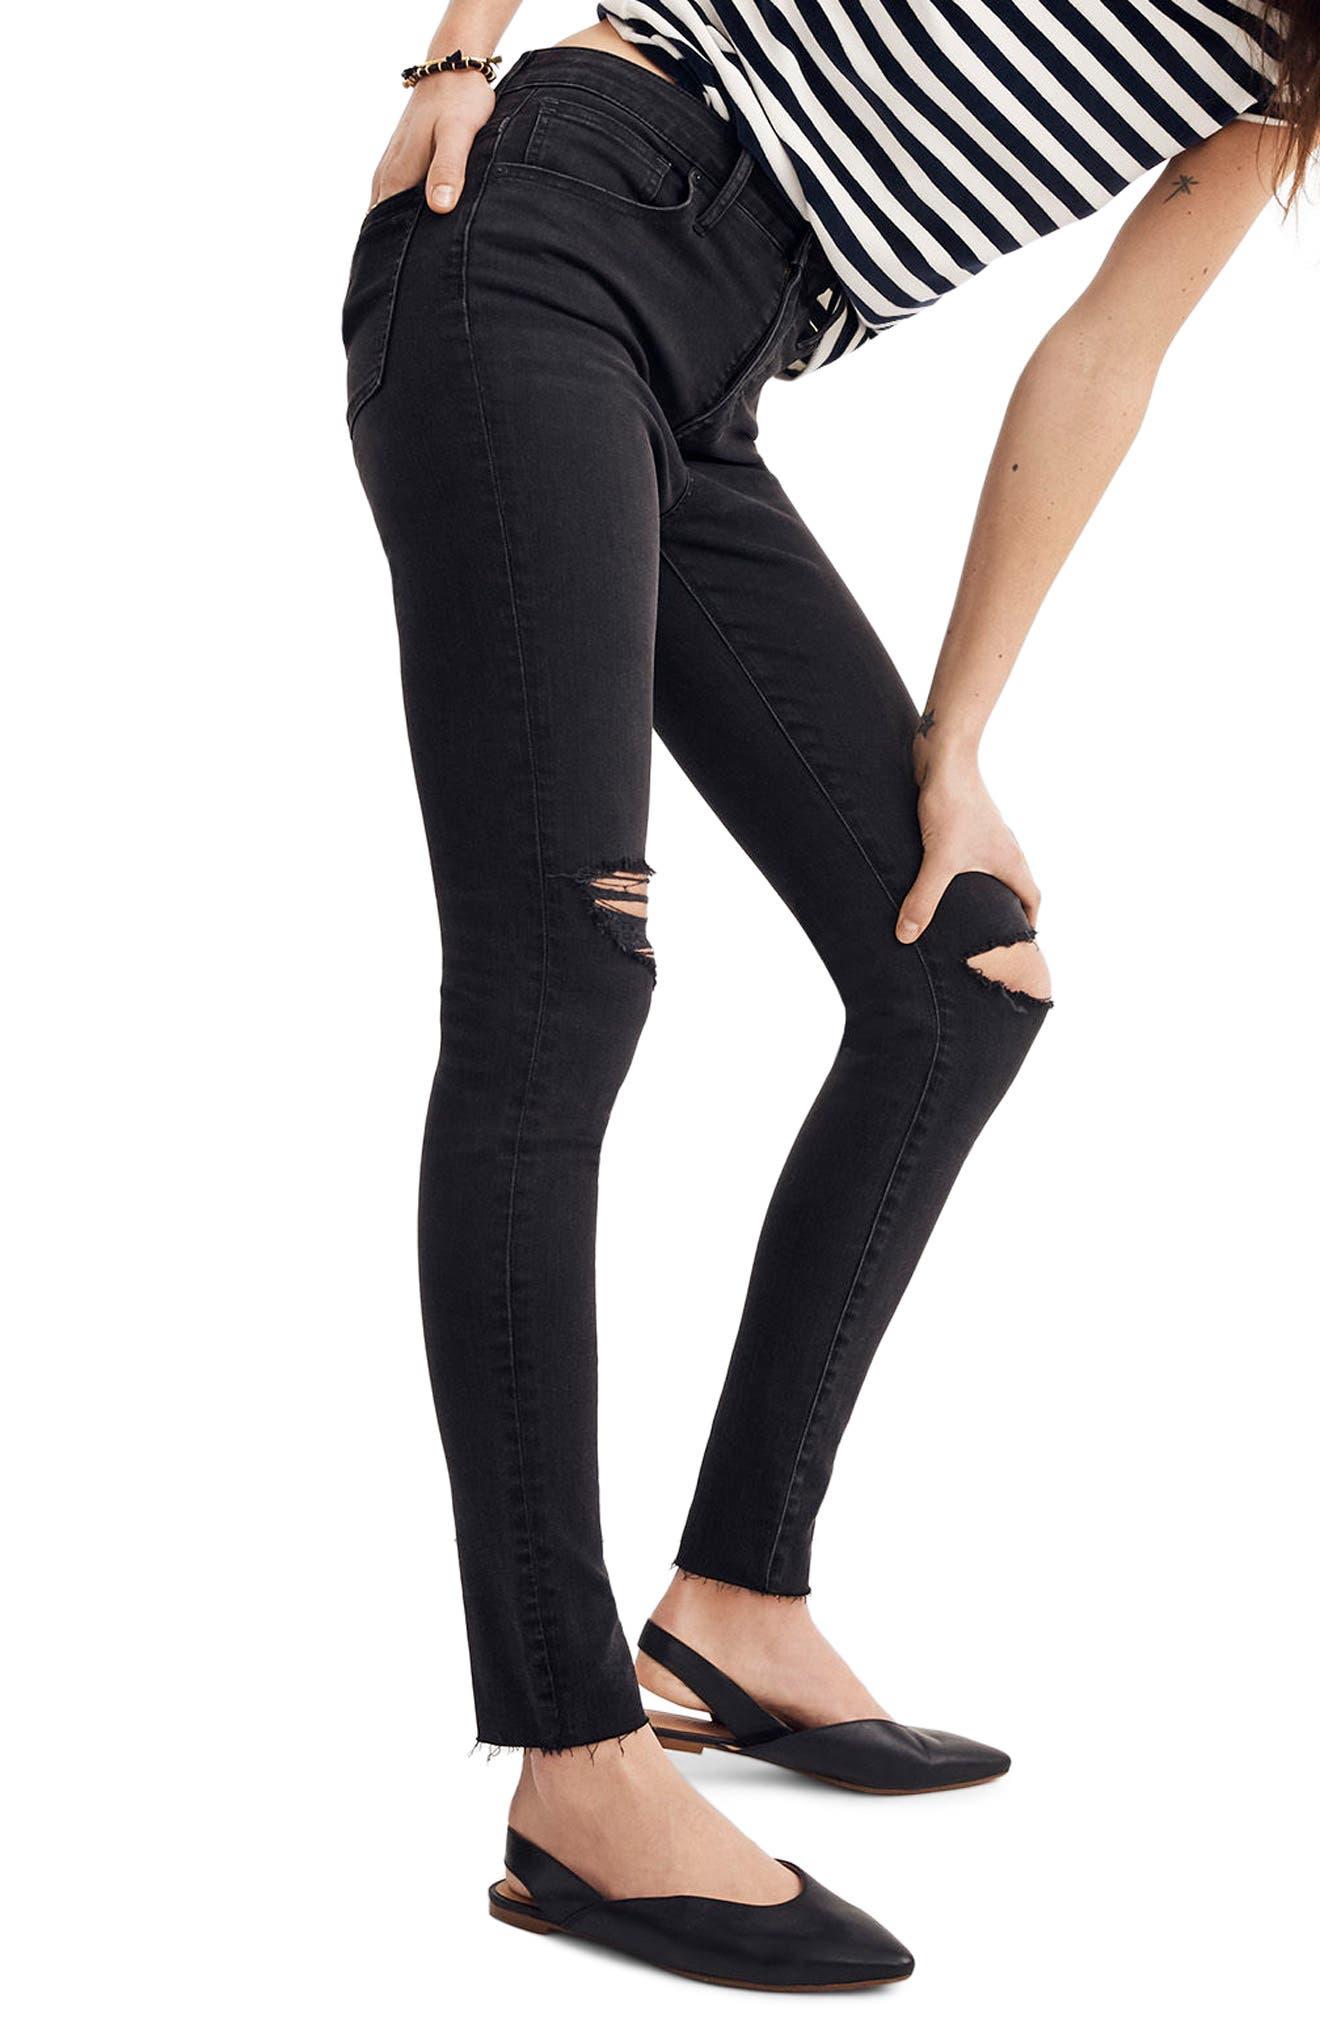 Women's Madewell Curvy High Waist Skinny Jeans